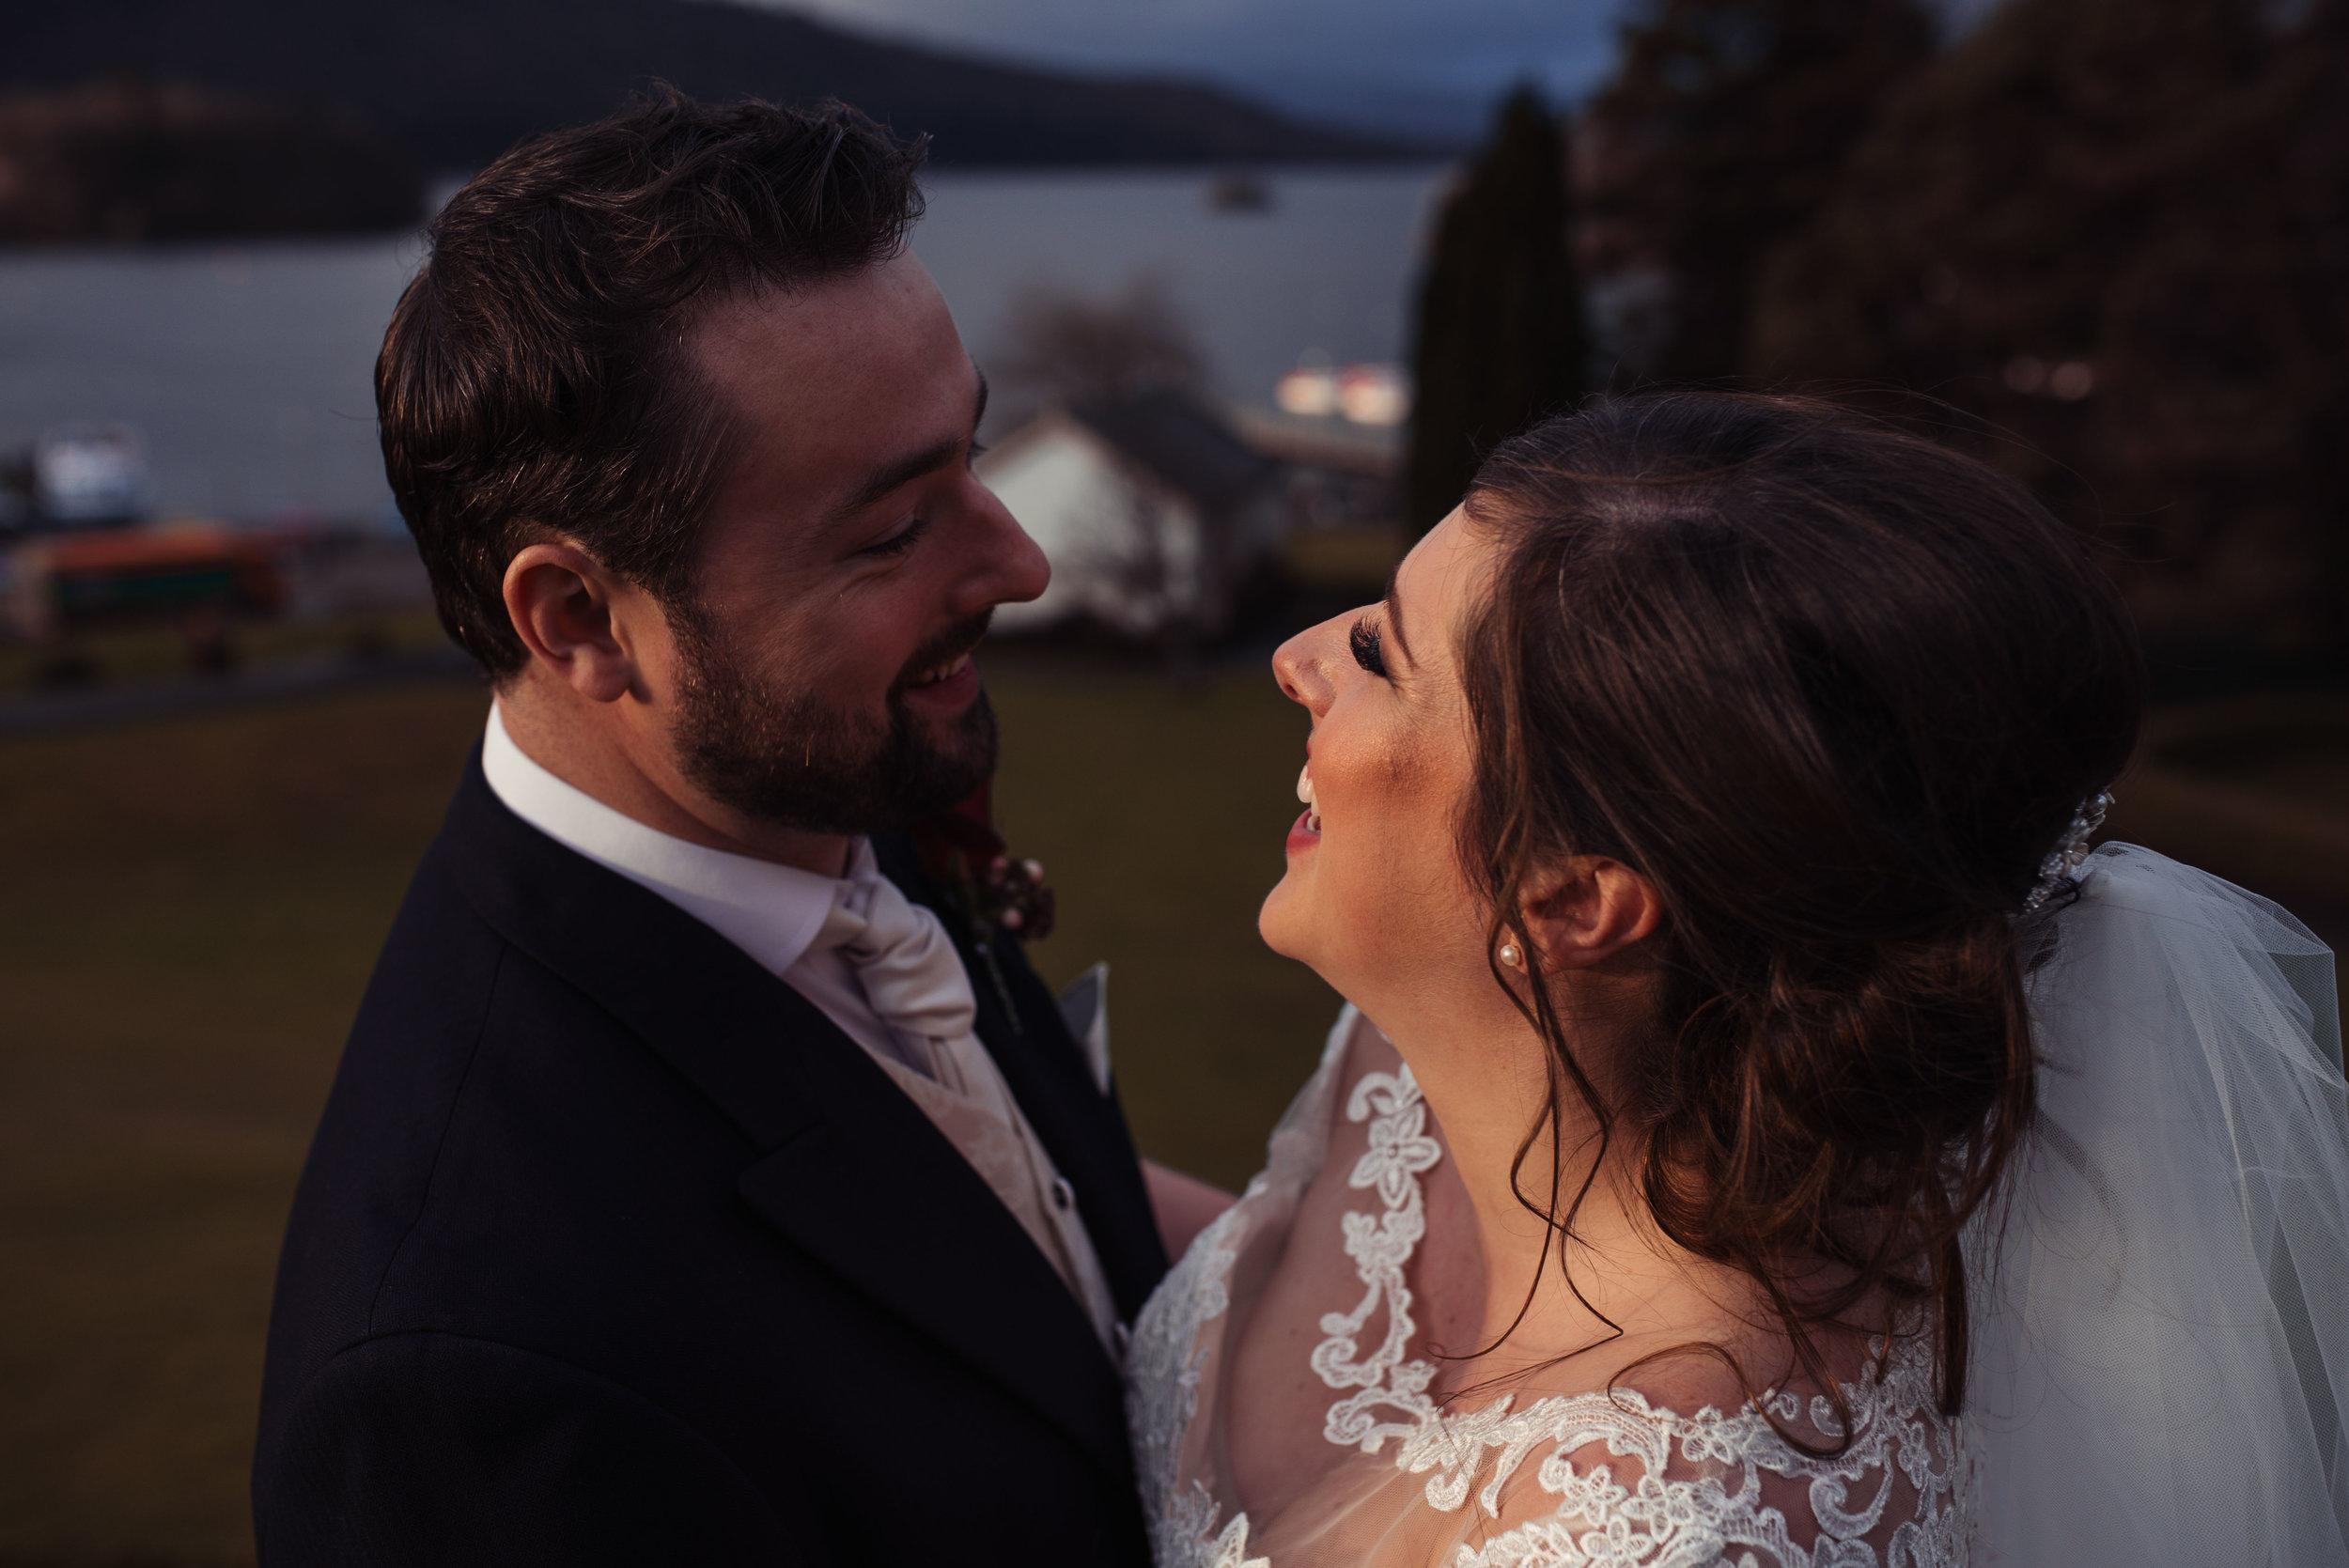 Belsfield-wedding-photography-29.jpg